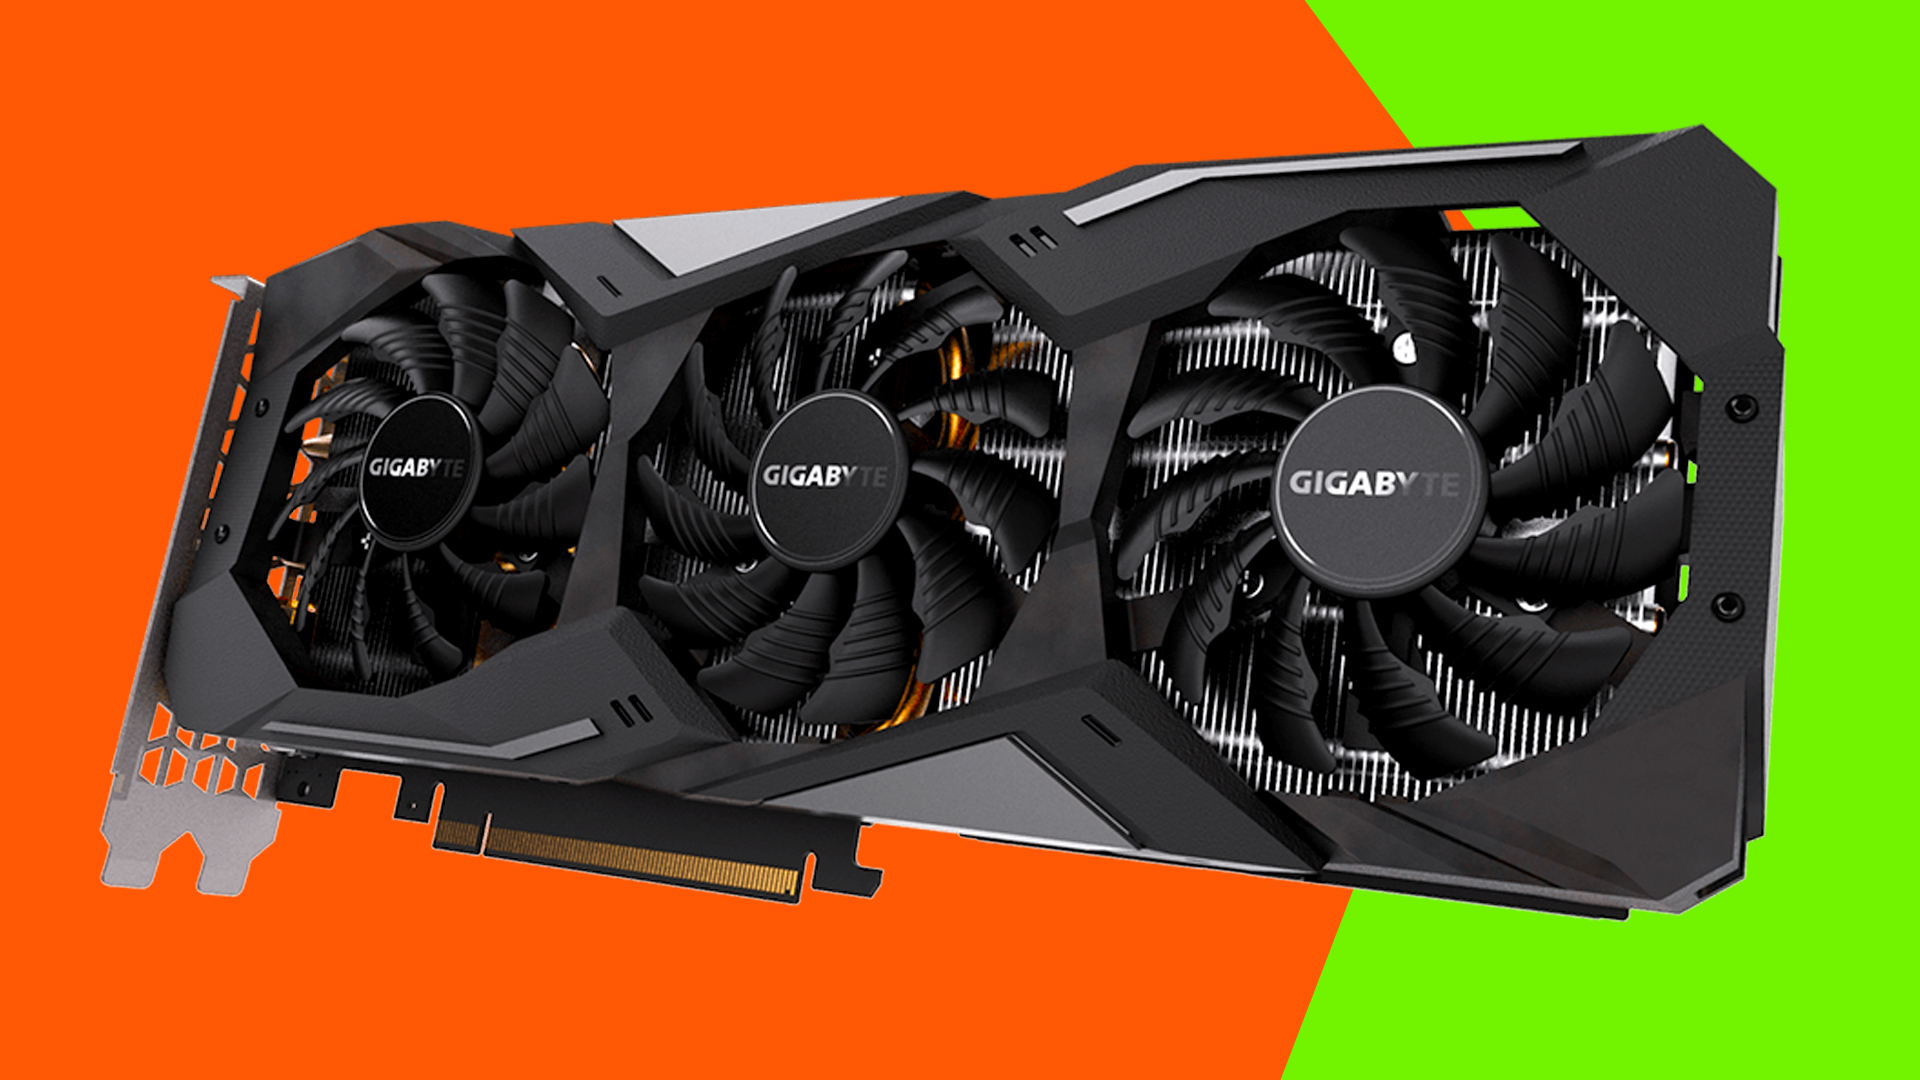 GIGABYTE GeForce RTX 2070 GAMING OC 8G Graphics Card Computer